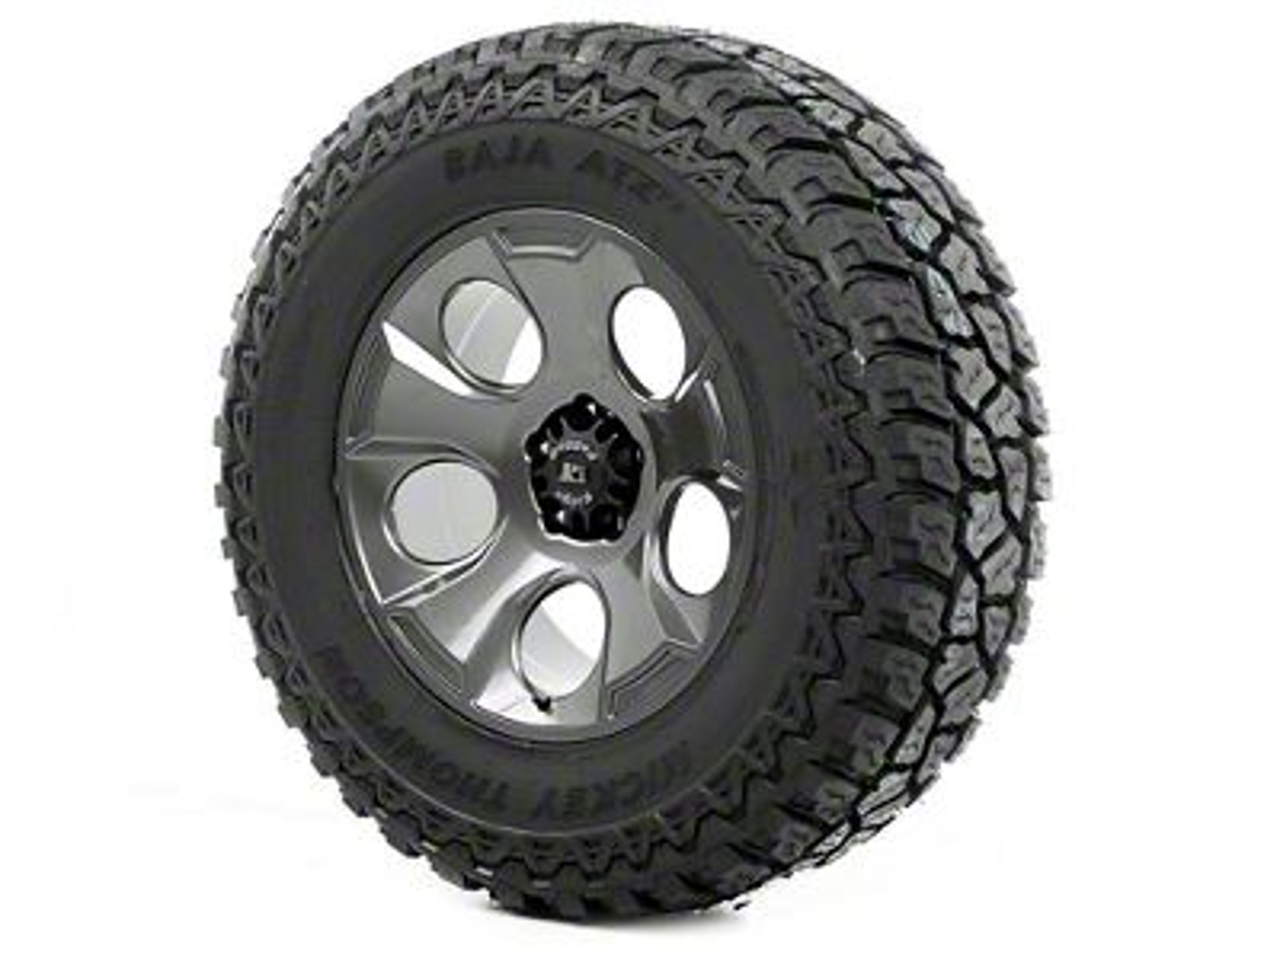 Rugged Ridge Drakon Wheel 20x9 Gun Metal and Mickey Thompson ATZ P3 37x12.50x20 Tire (13-18 Jeep Wrangler JK; 2018 Jeep Wrangler JL)